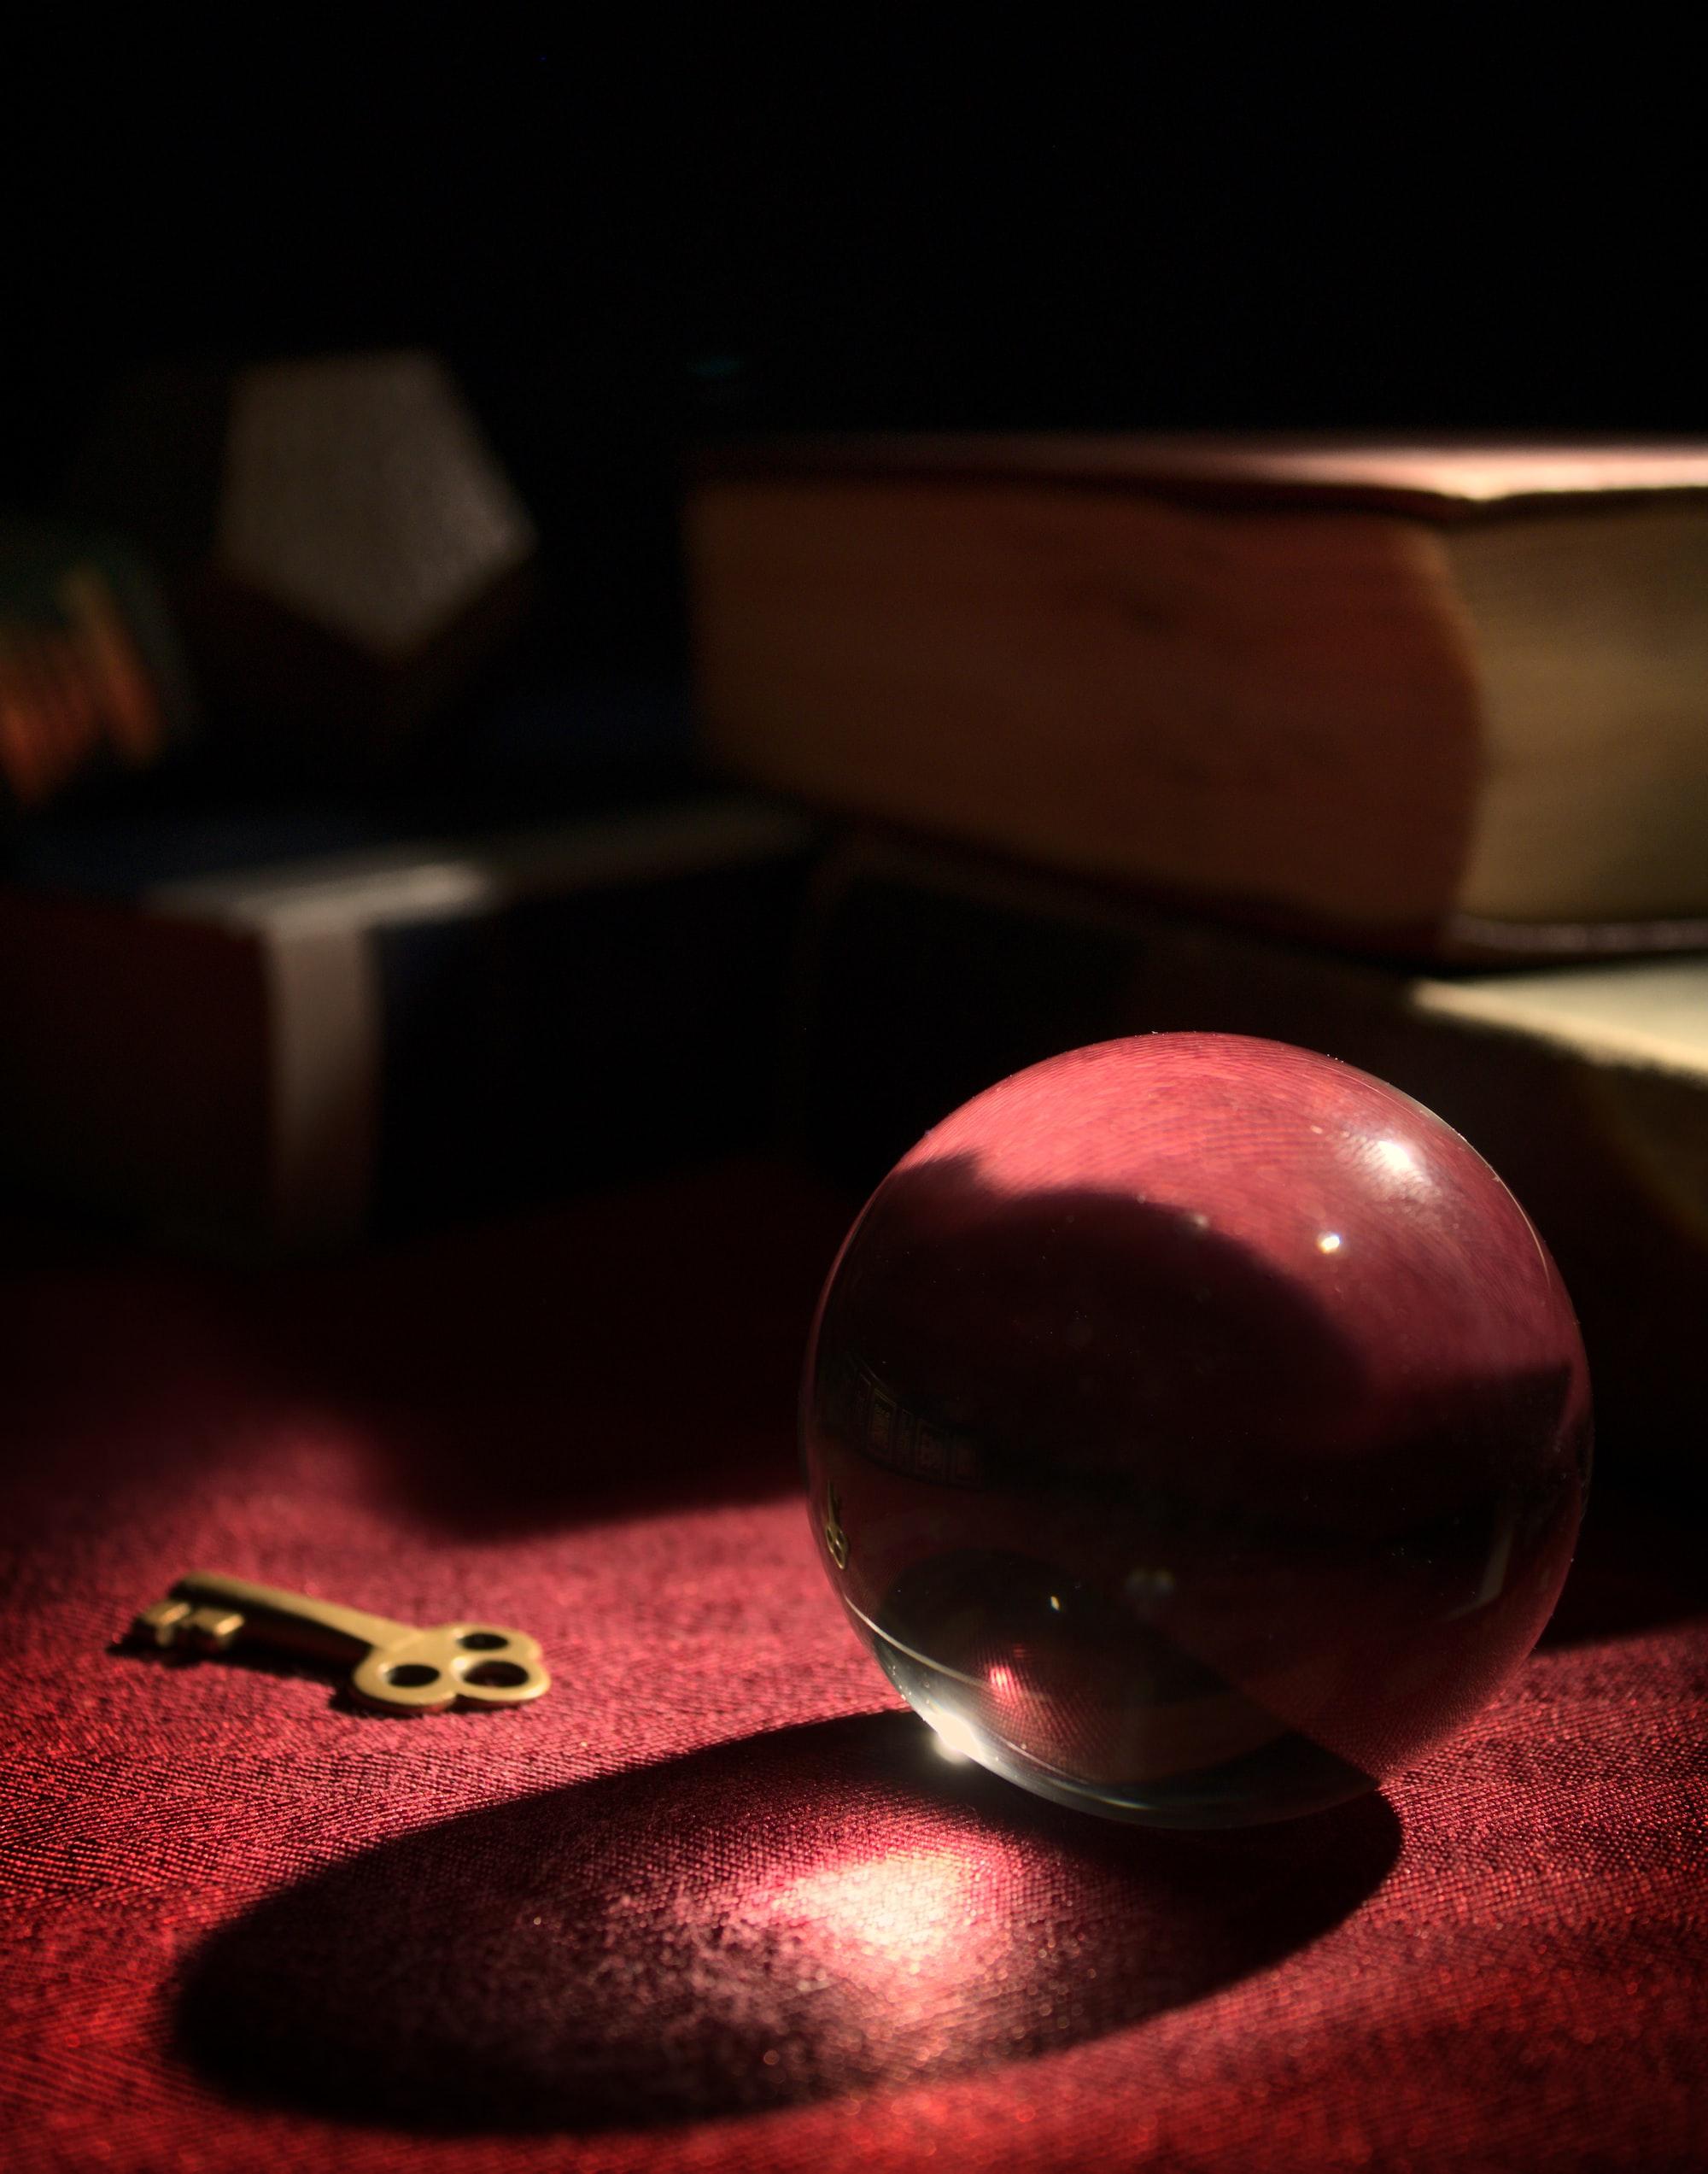 Bakspejl og krystalkugle: JuleTechlivs vejviser til årets lister